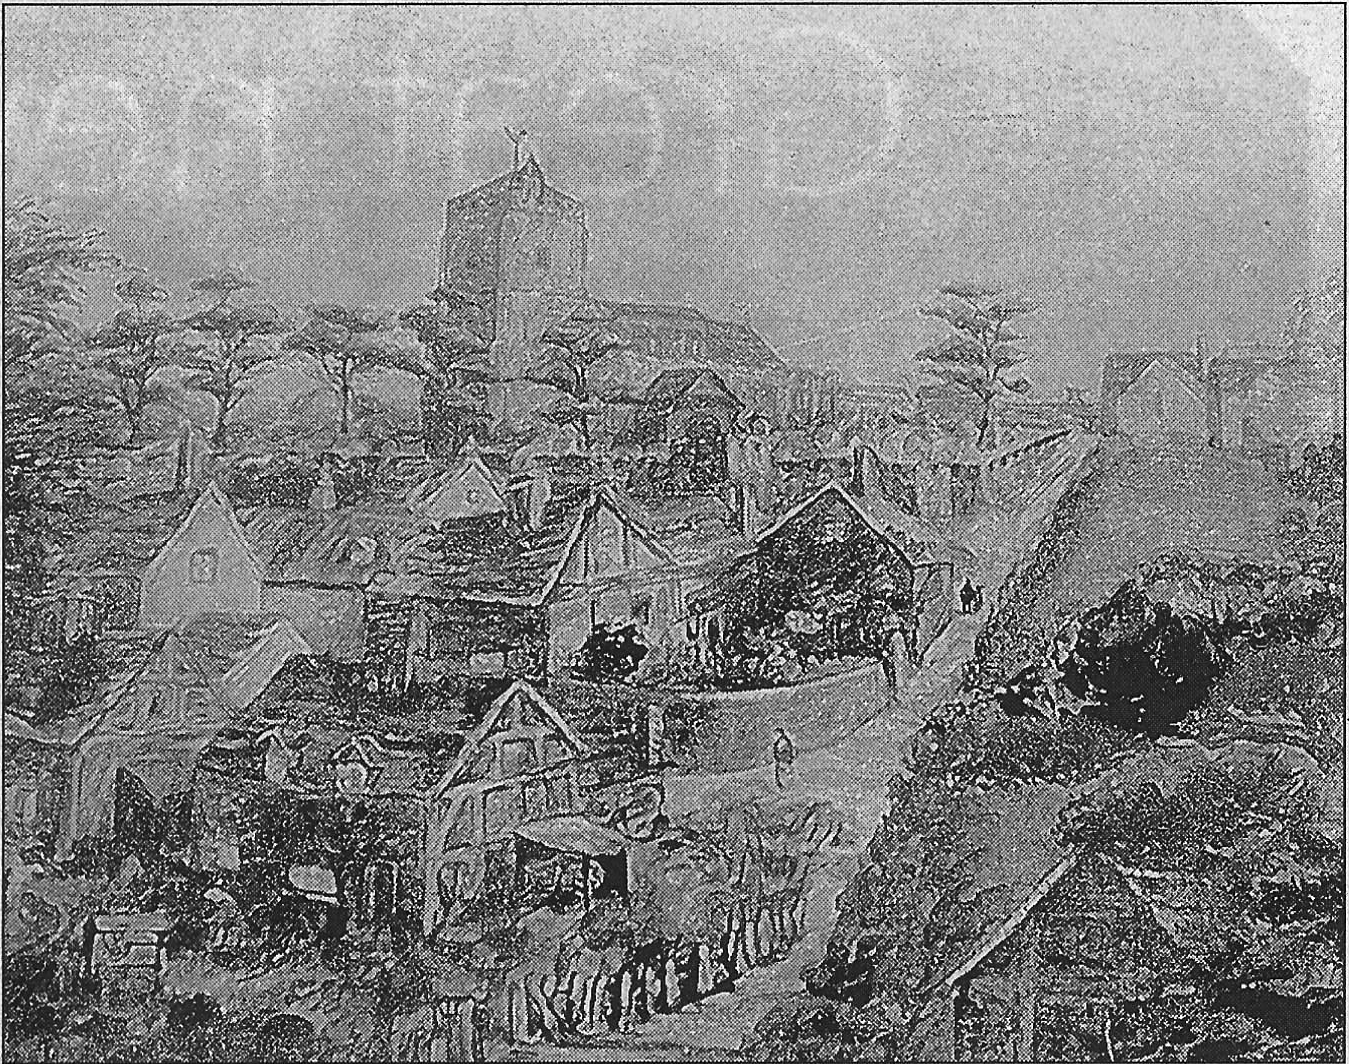 Sutton Coldfield c. 1800